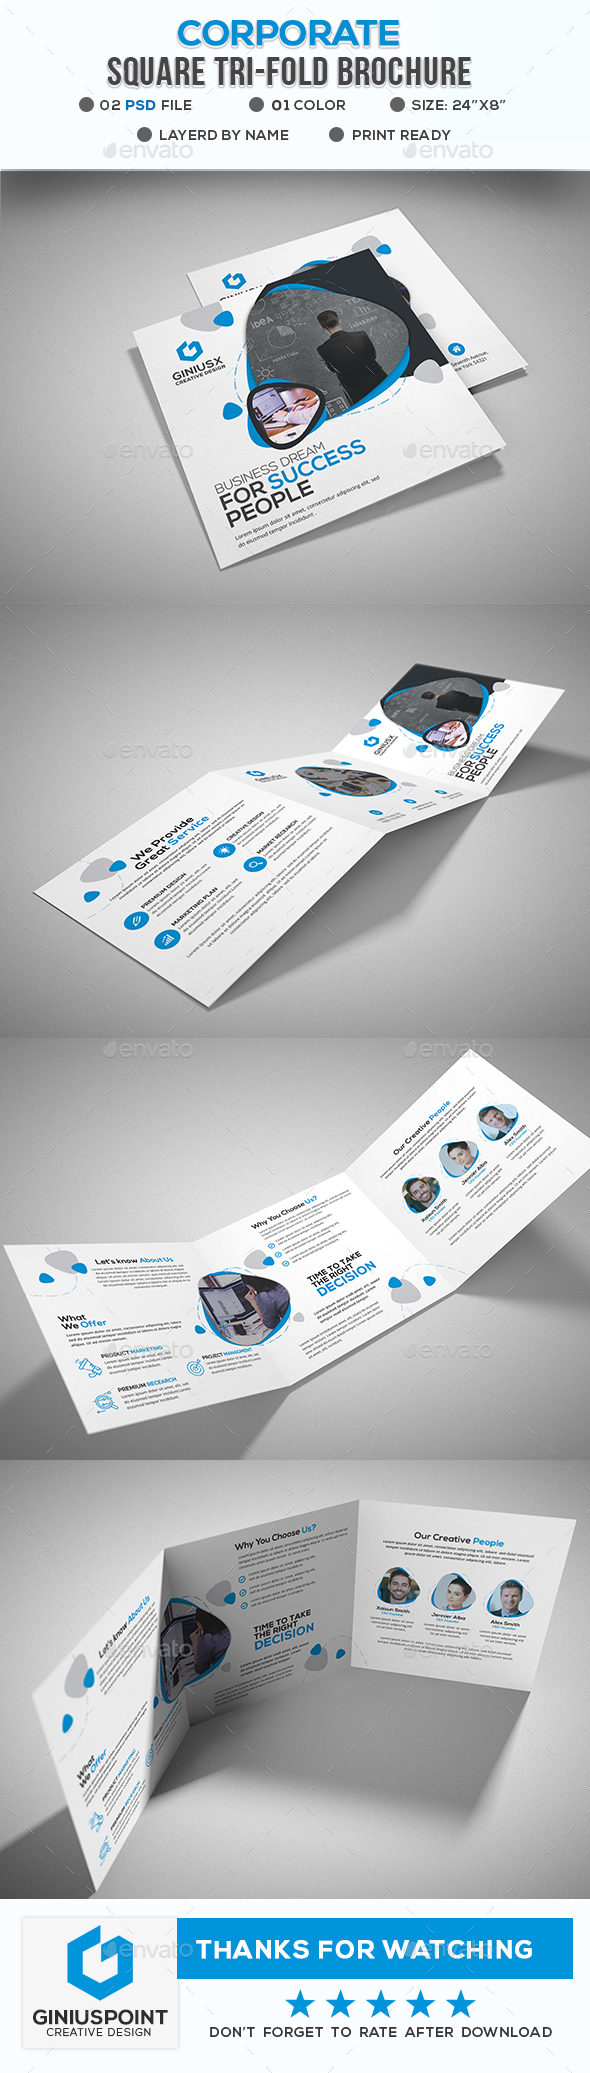 Corporate Square Tri-Fold Brochure - Brochures Print Templates